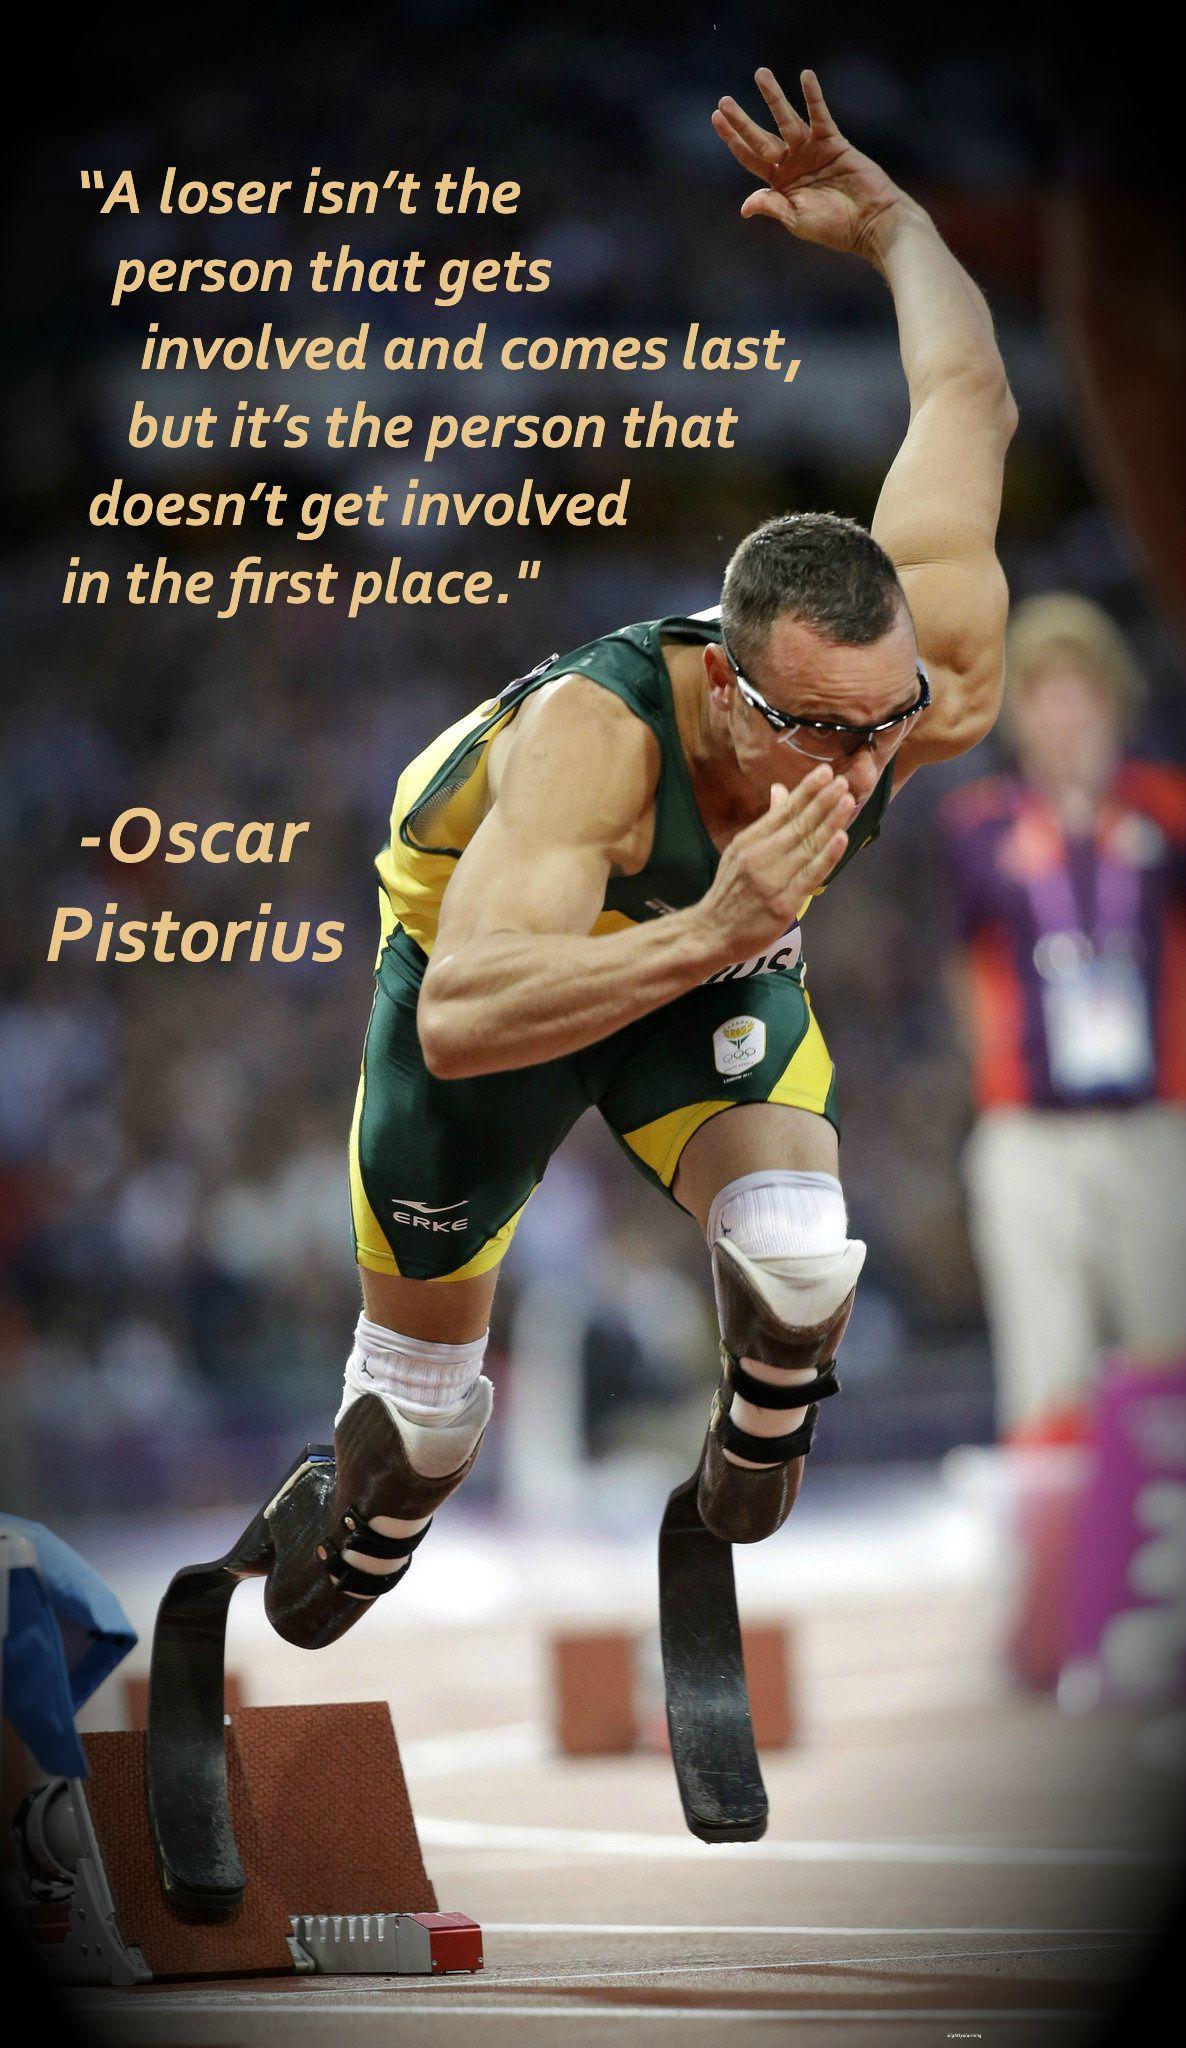 Oscar Pistorius's quote #3